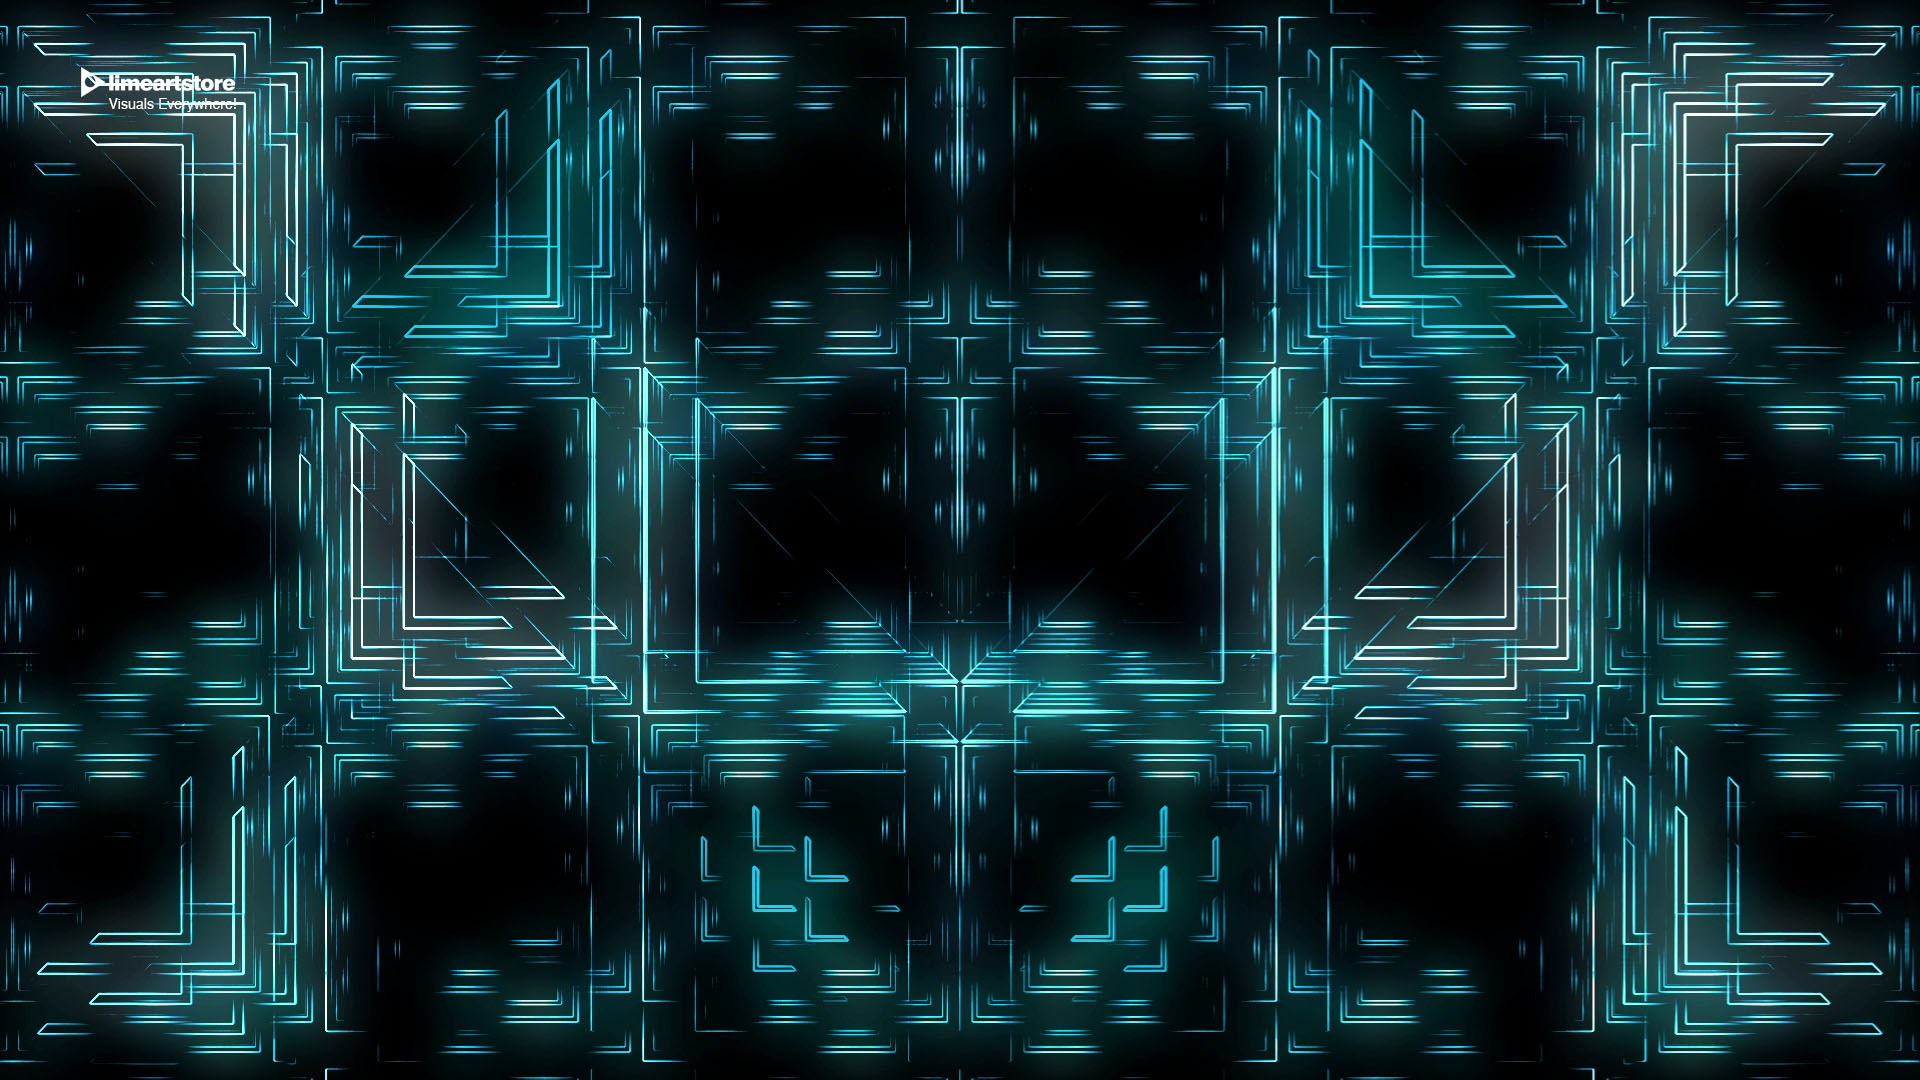 VJ Loops Minimal Video Footages Motion Lines HD VIsuals 1